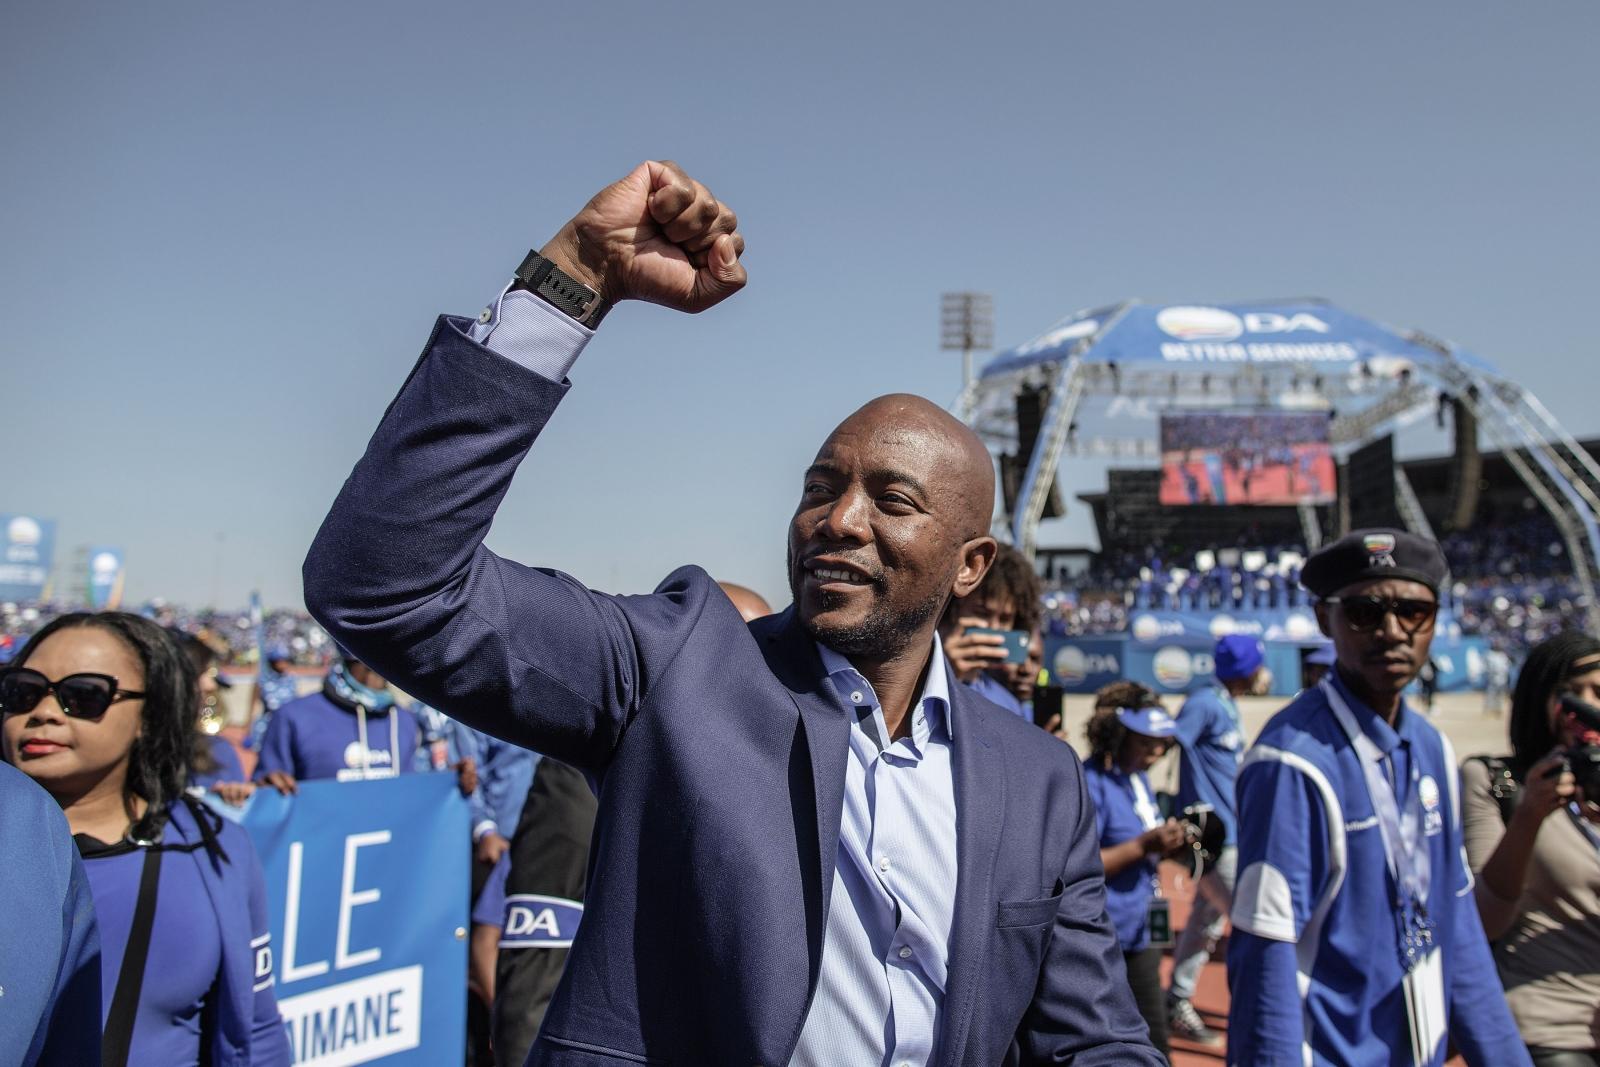 Democratic Alliance leader Mmusi Maimane